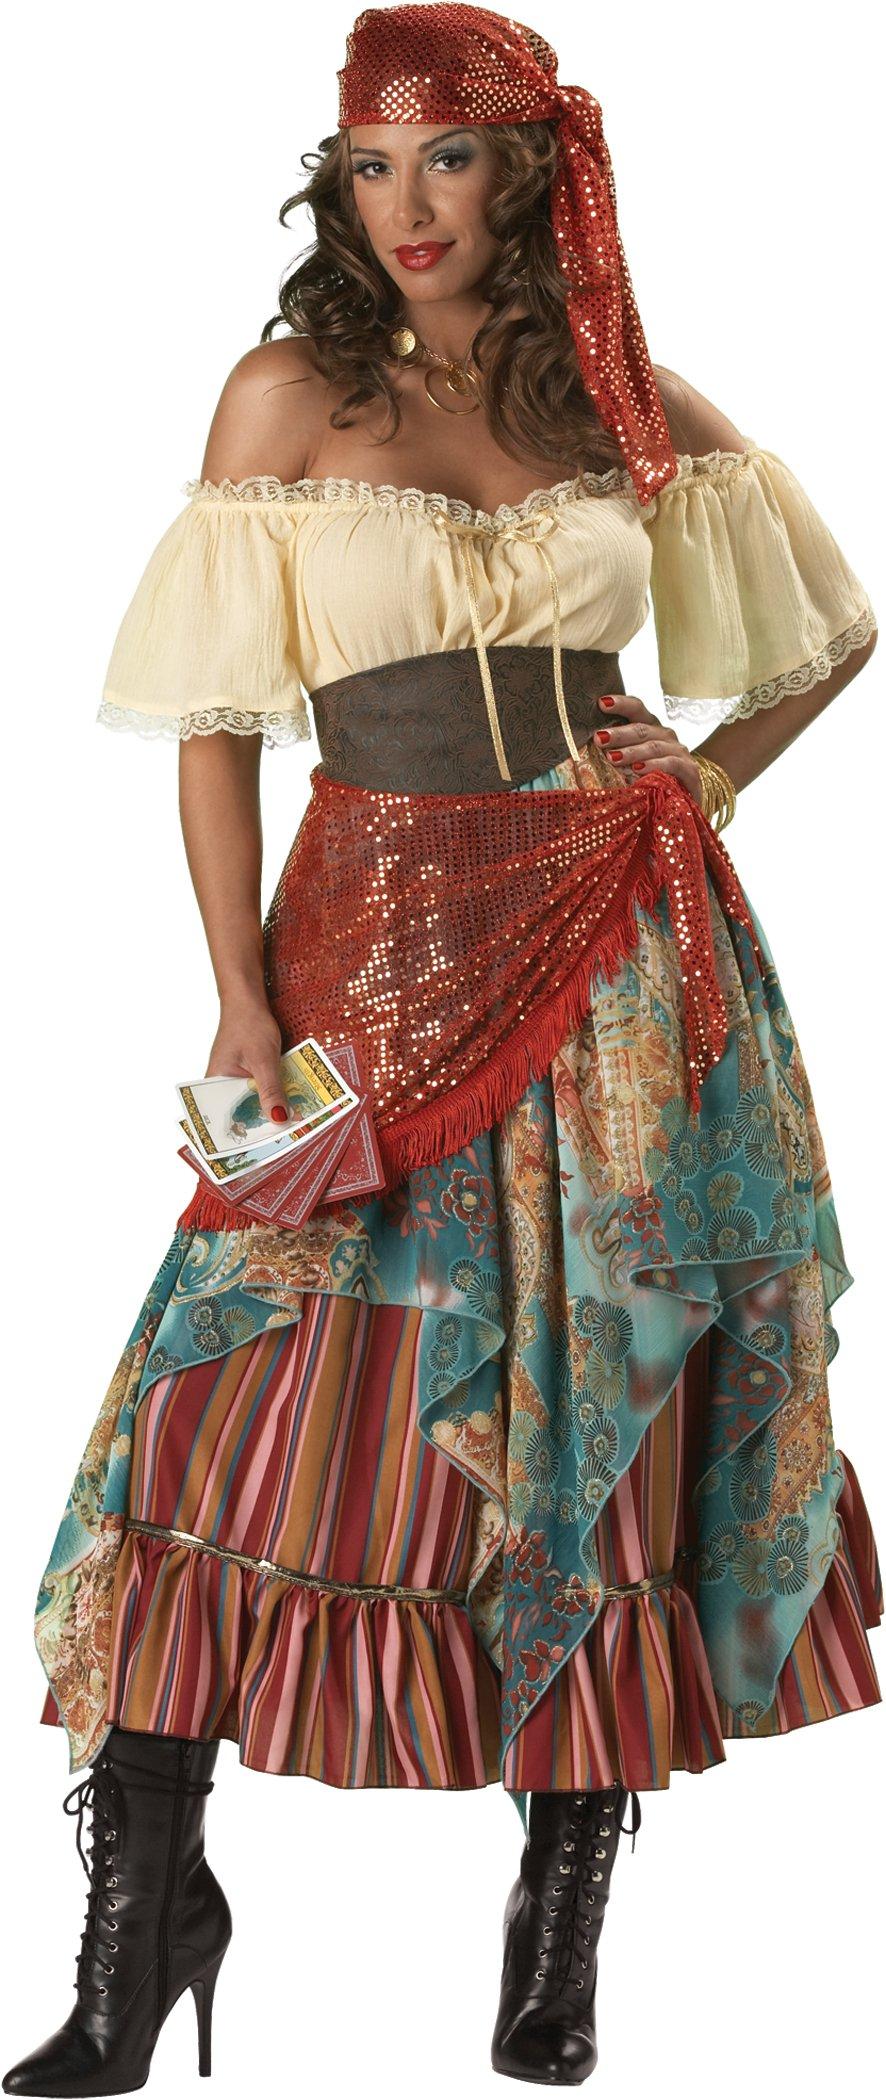 InCharacter Costumes Women's Fortune Teller Costume Tan/Red/Blue, Medium